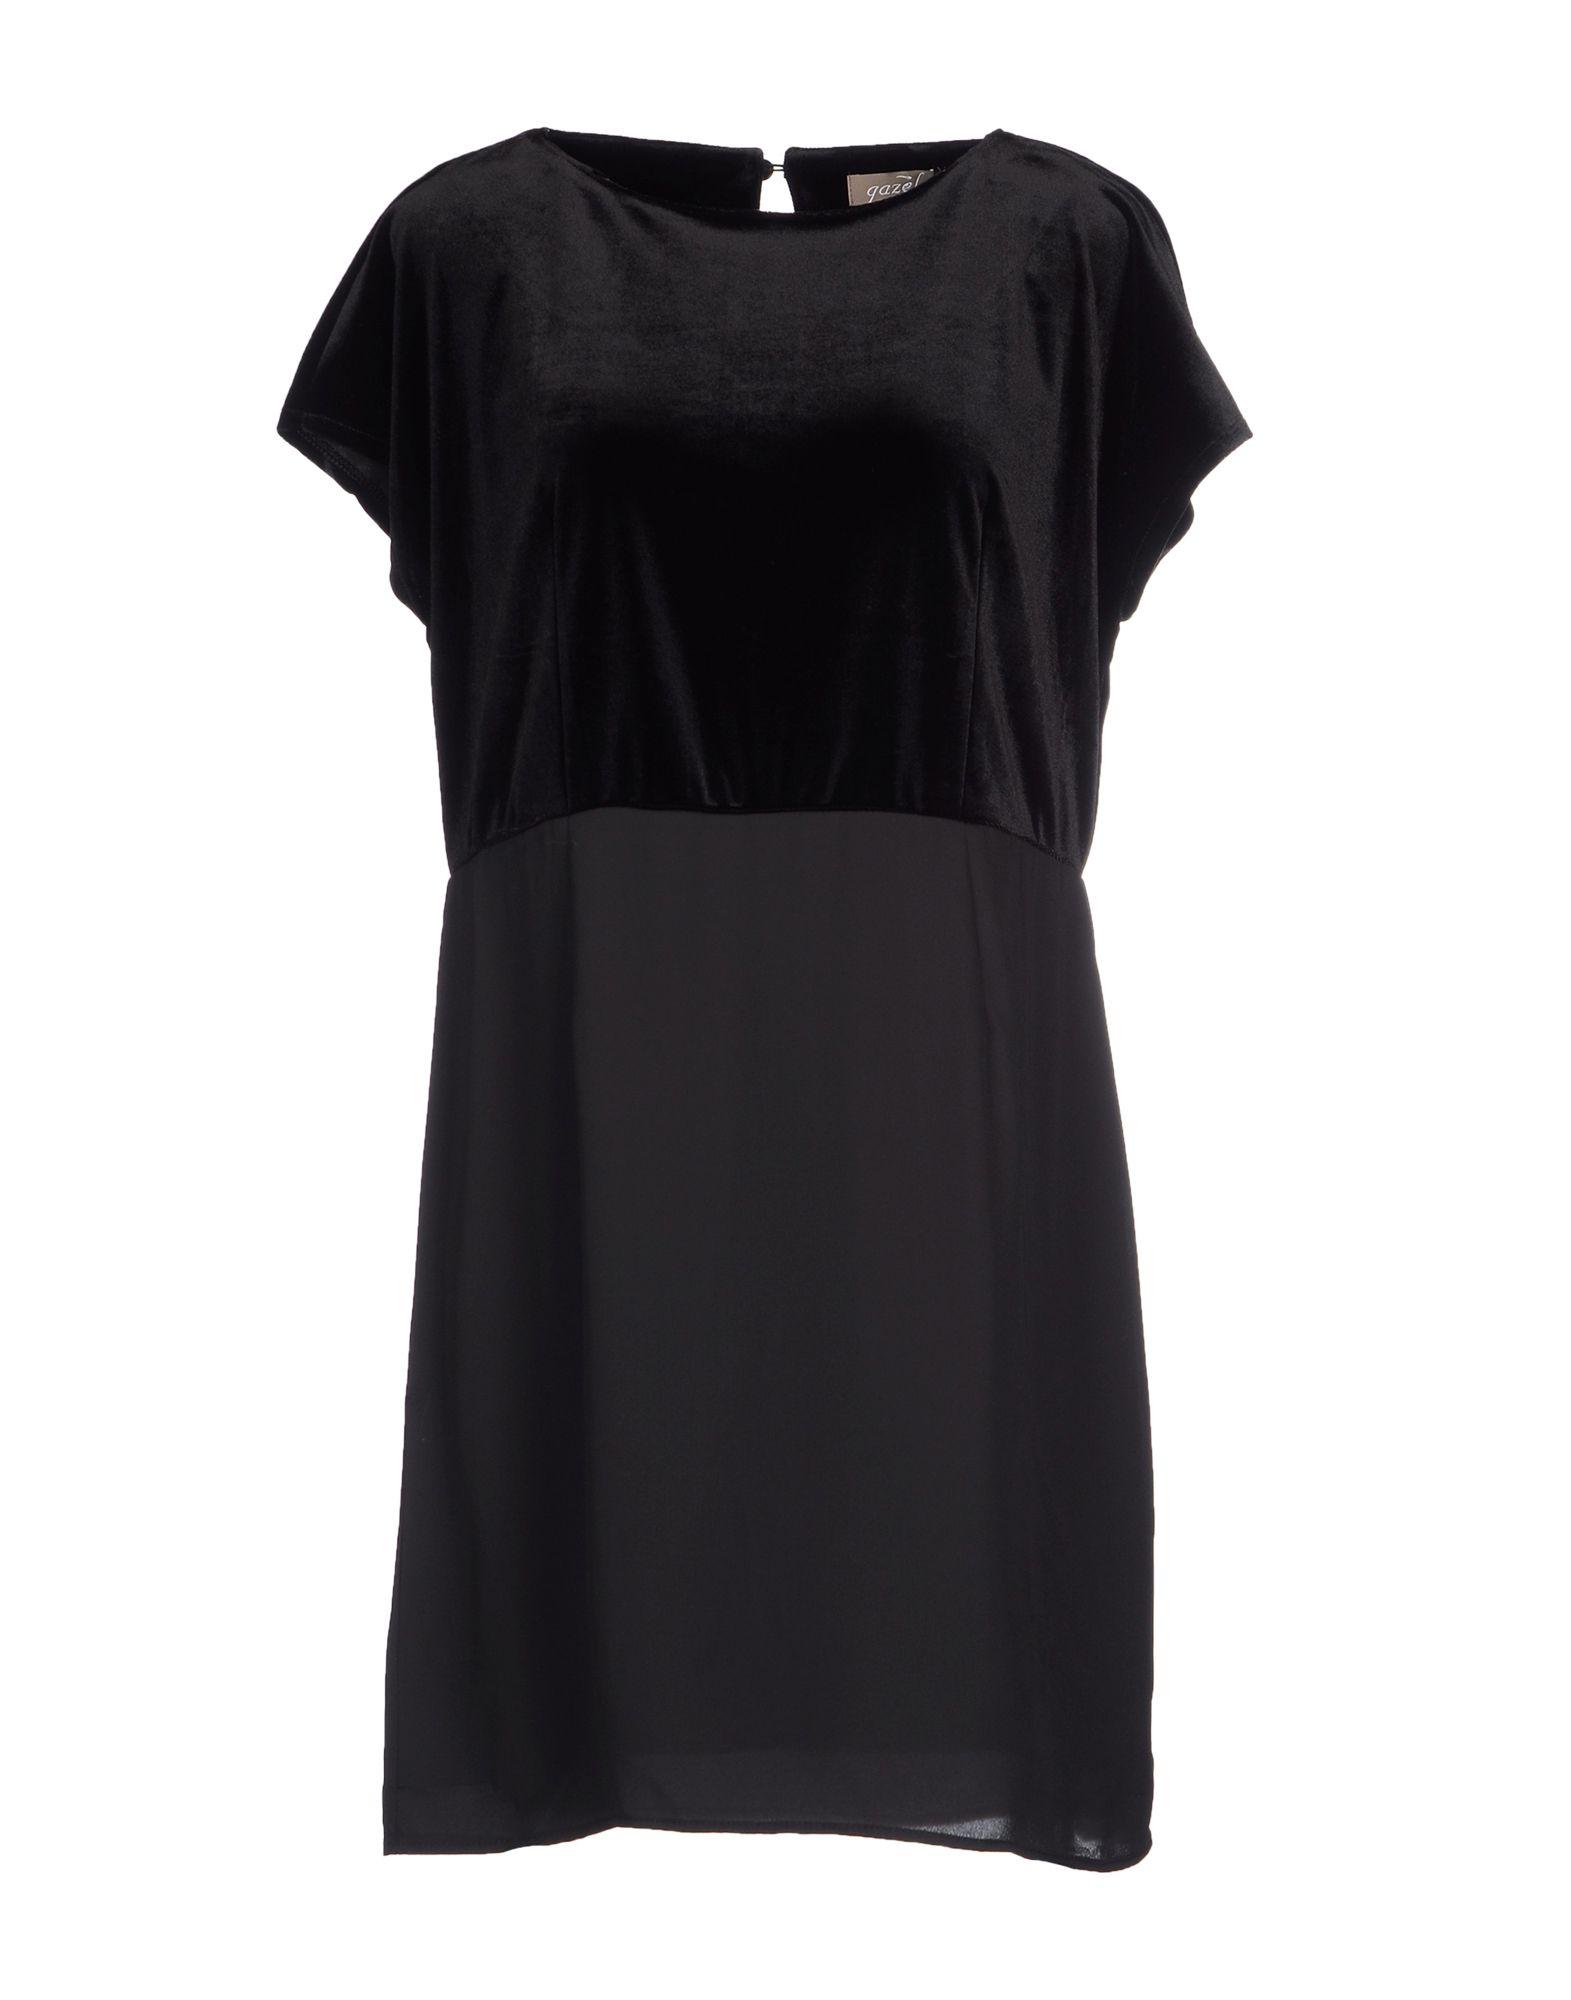 GAZEL Damen Kurzes Kleid Farbe Schwarz Größe 5